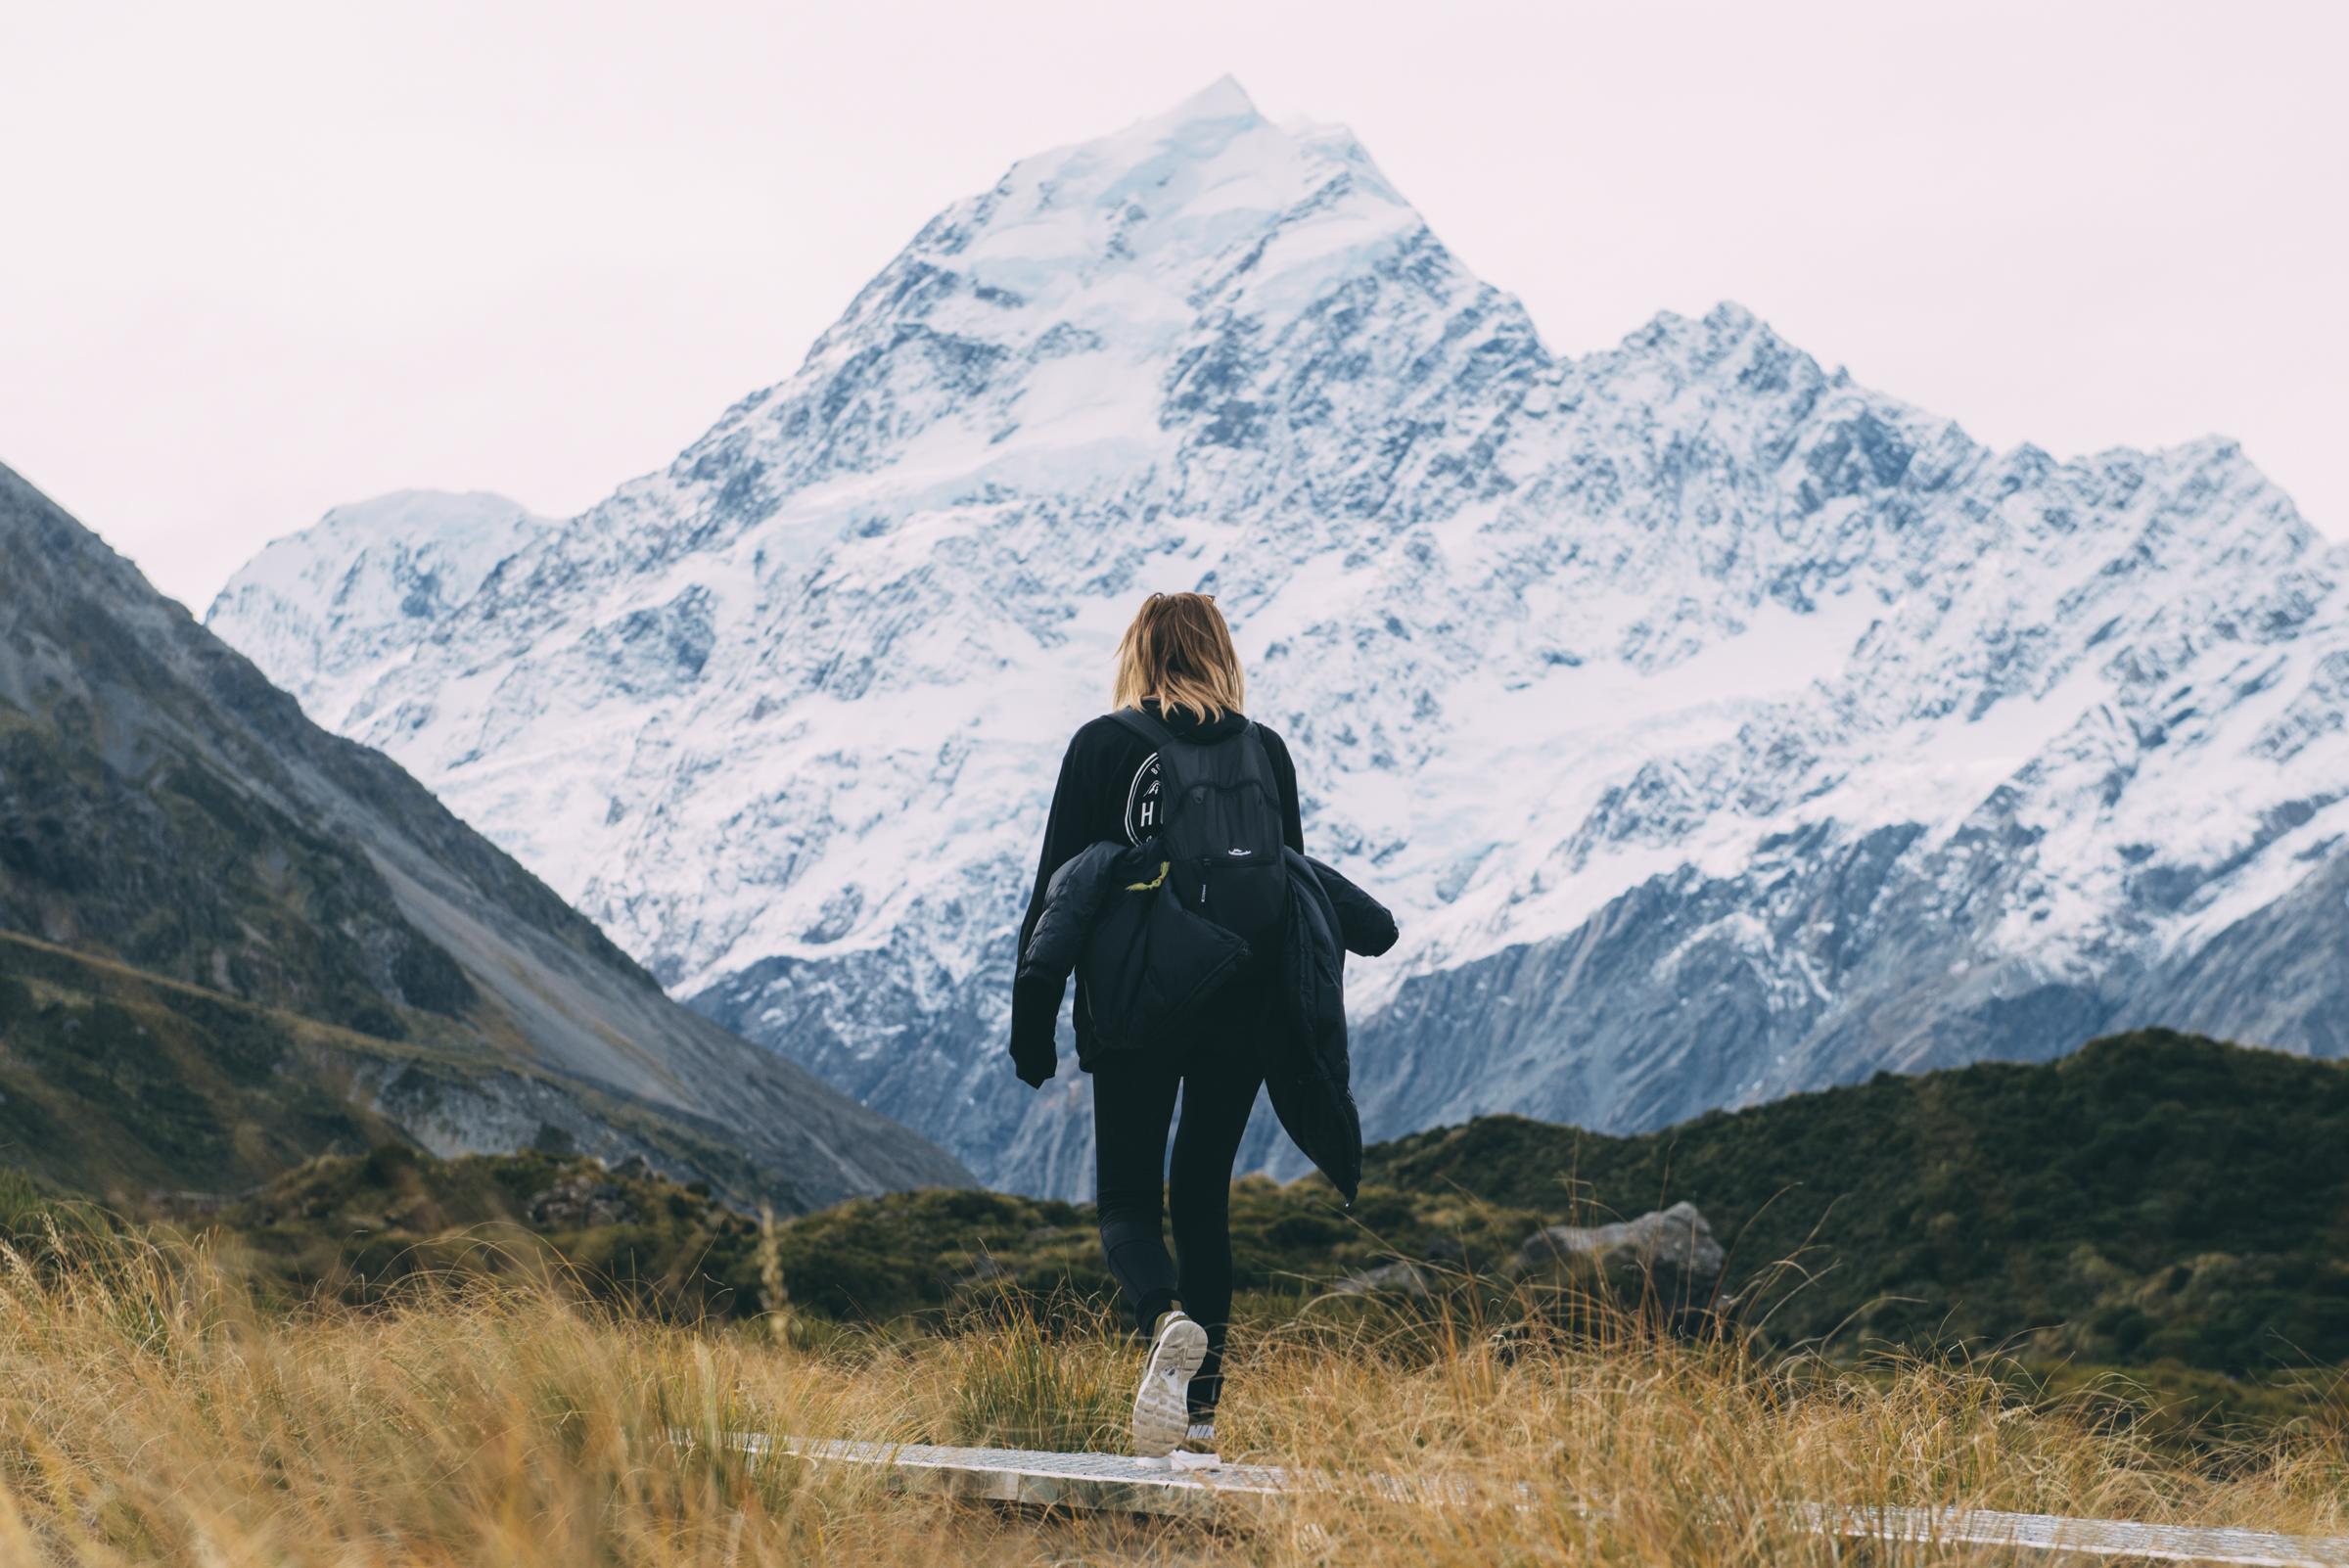 New Zealand Road Trip Lola Photography WEB_032.jpg